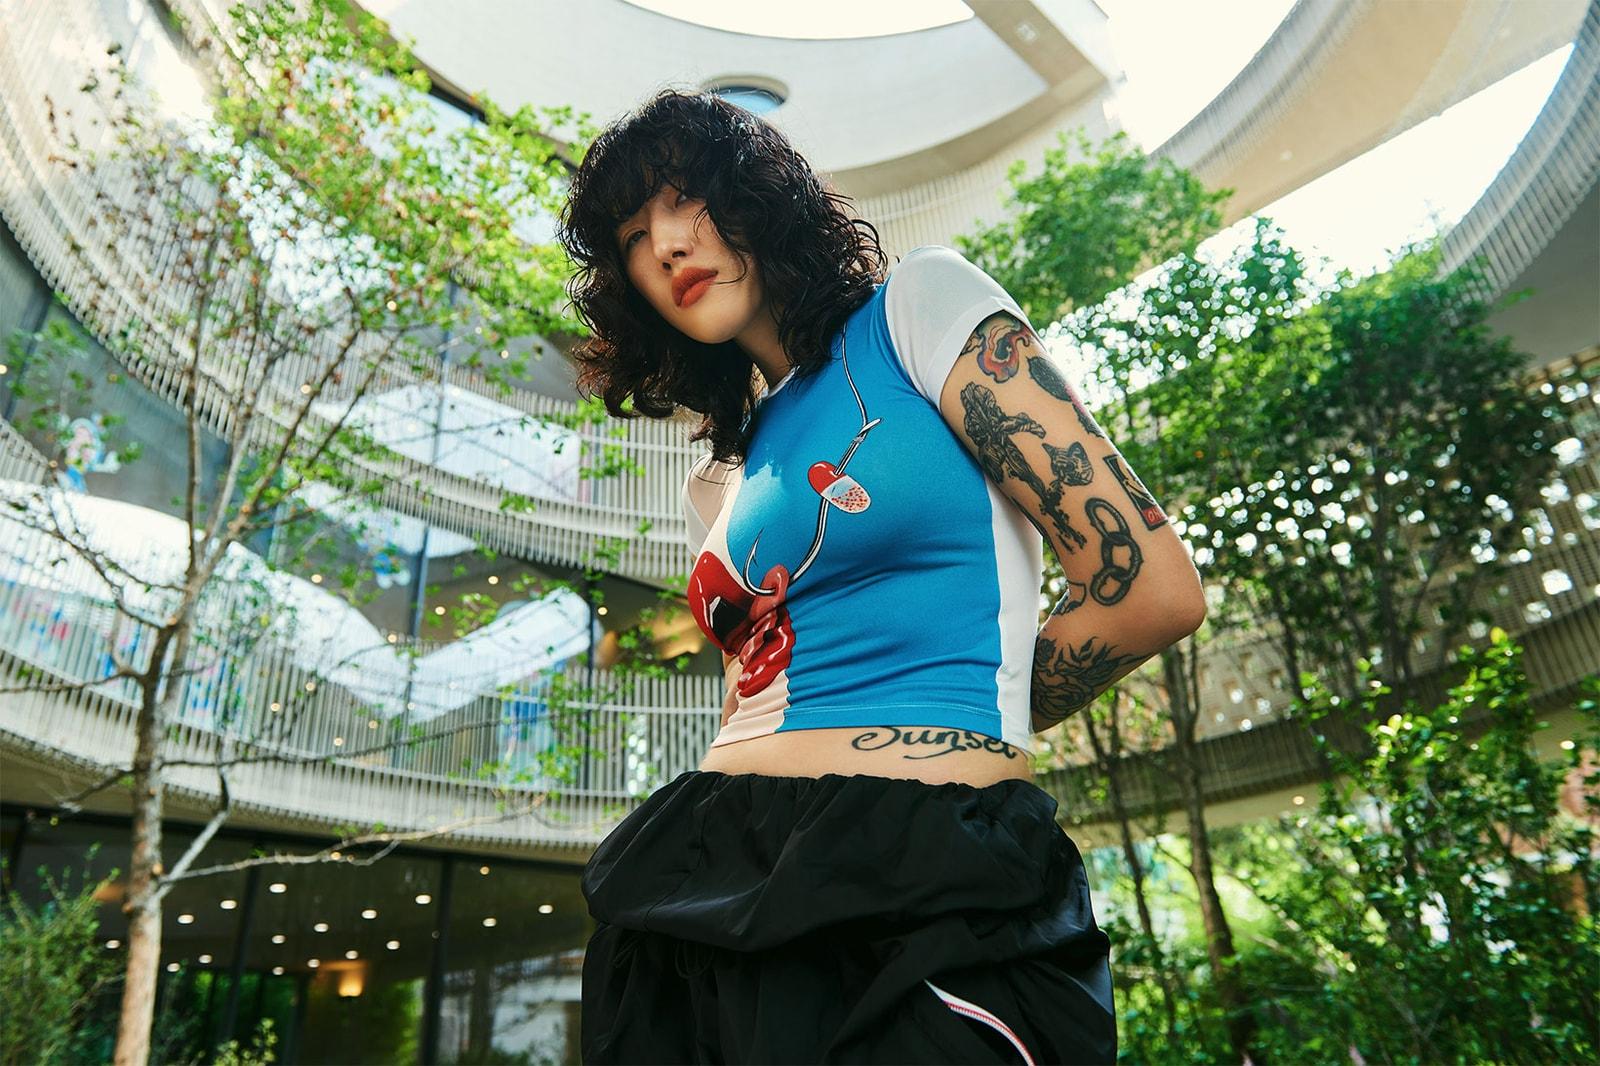 miki kim south korean tattooist illustrator interview portrait heights collaboration